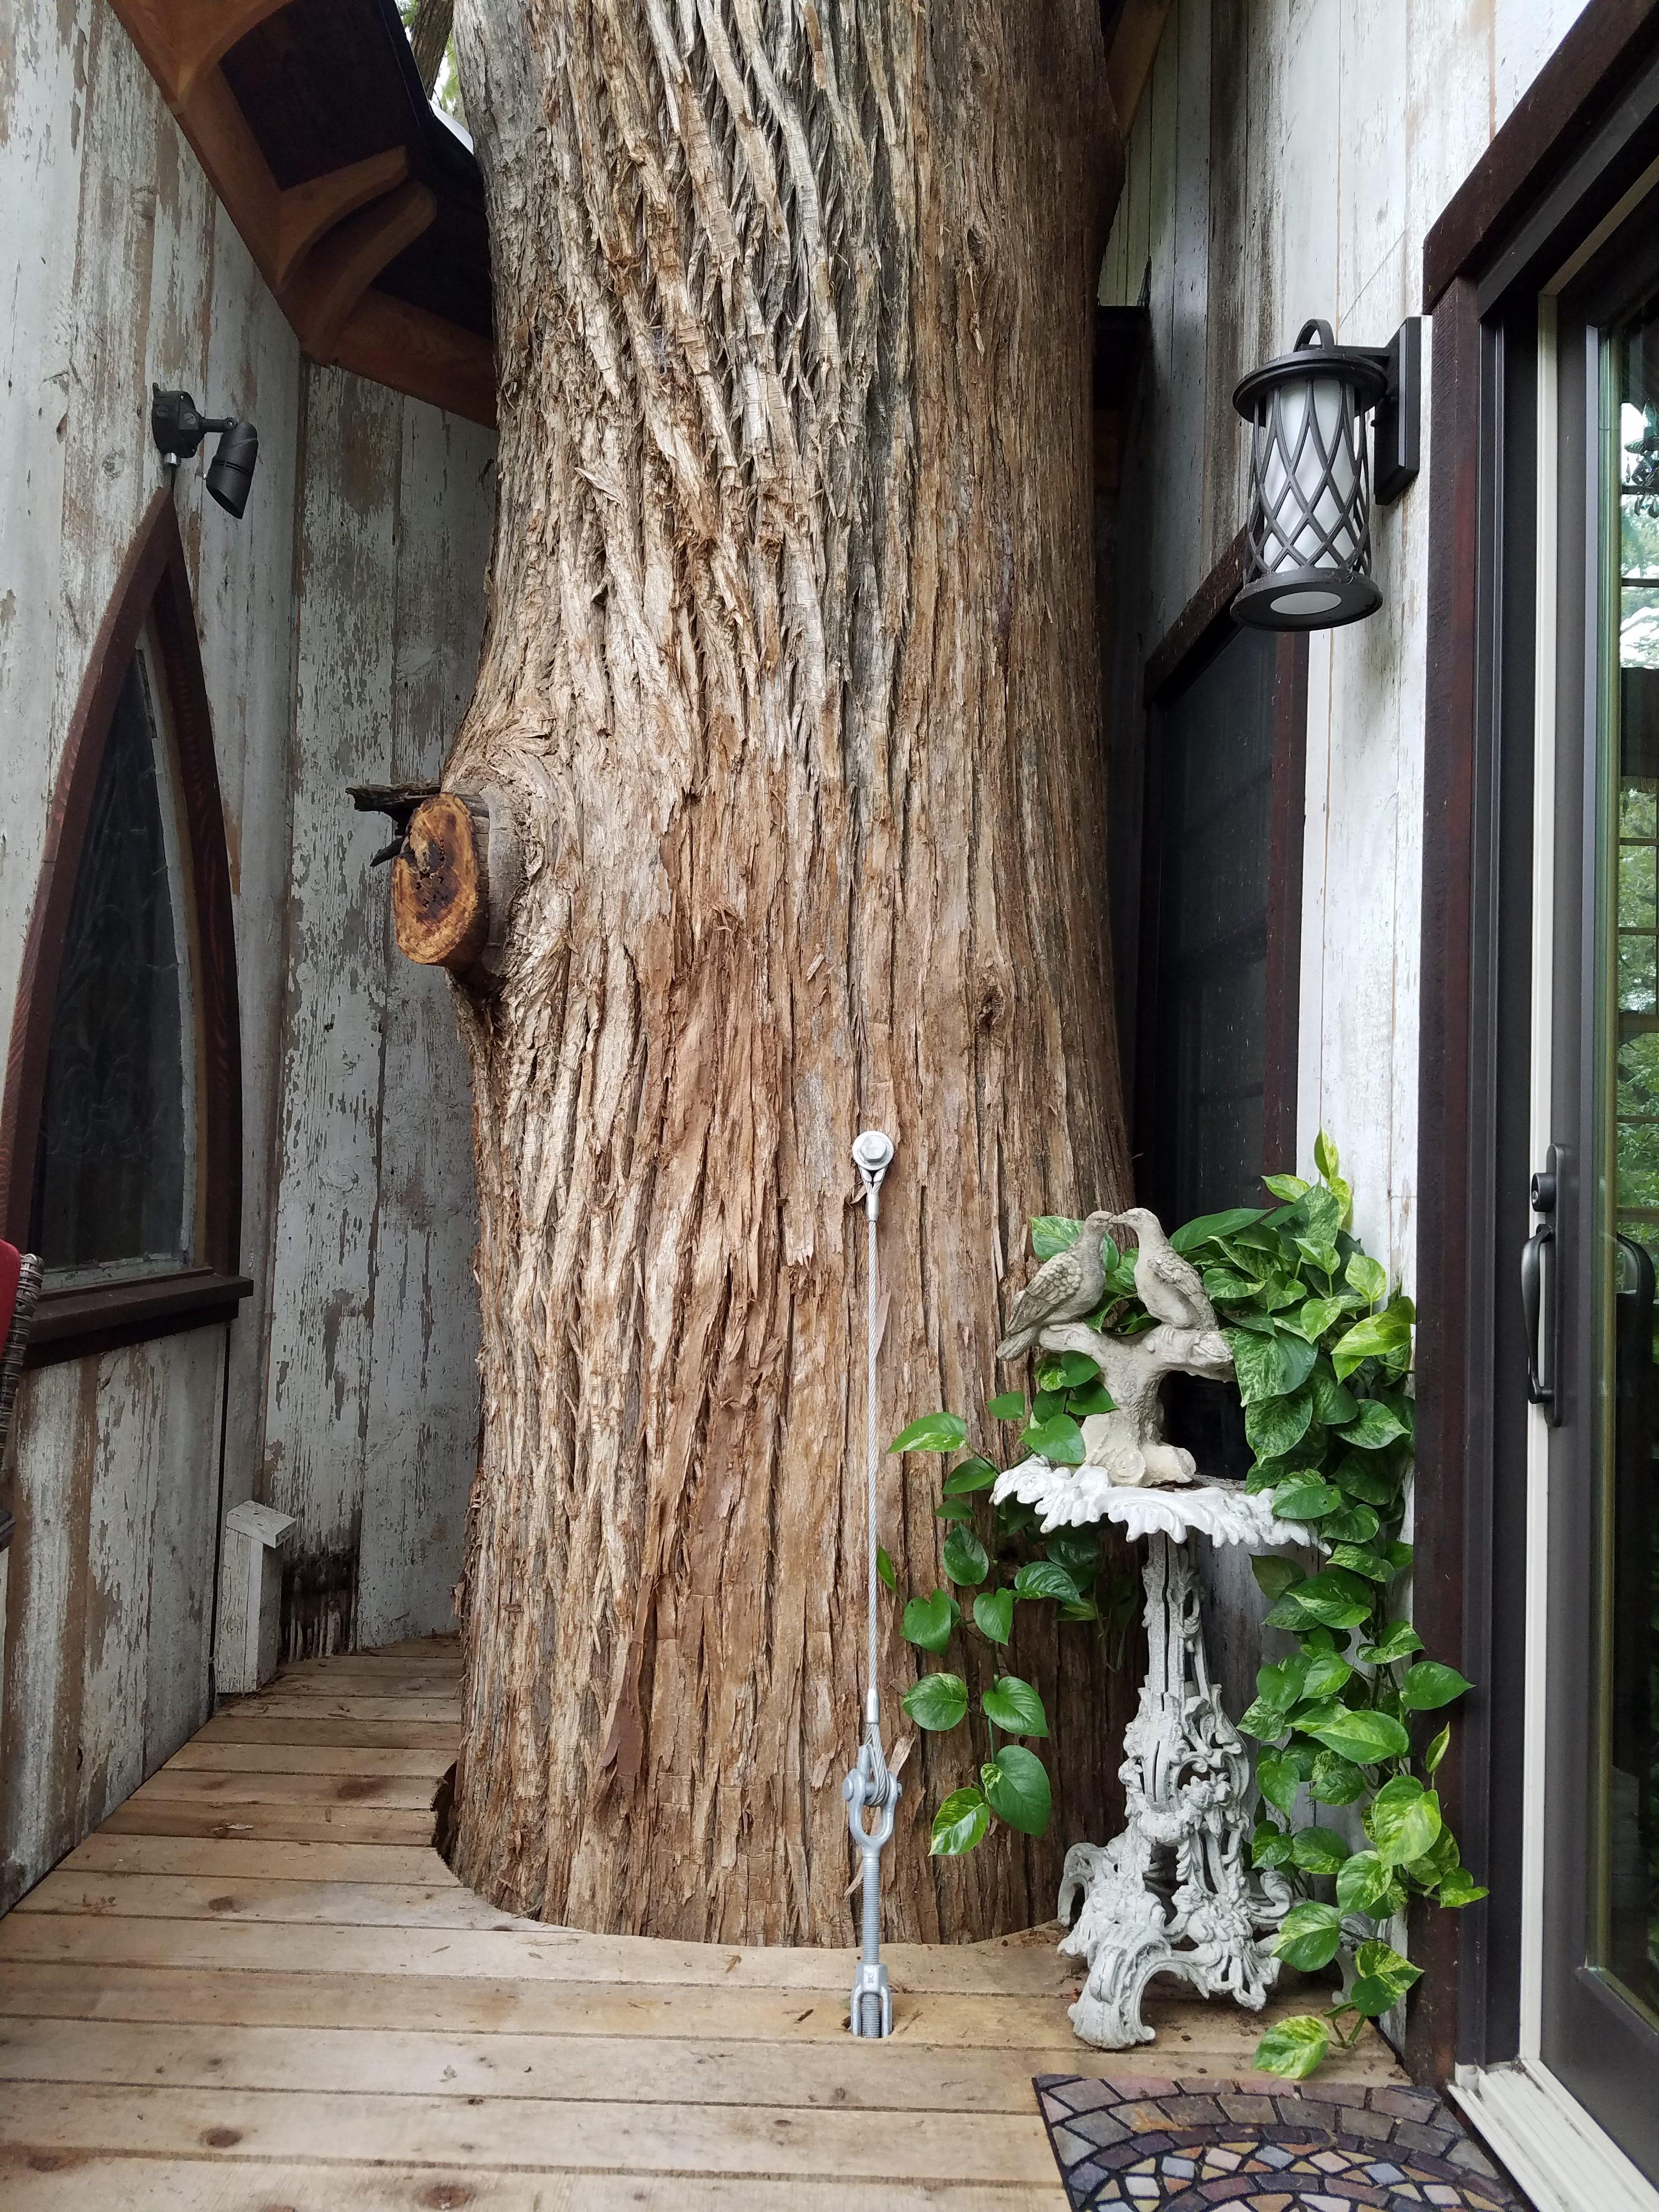 Utopia Treehouse Utopia Charlotte S Texas Hill Country